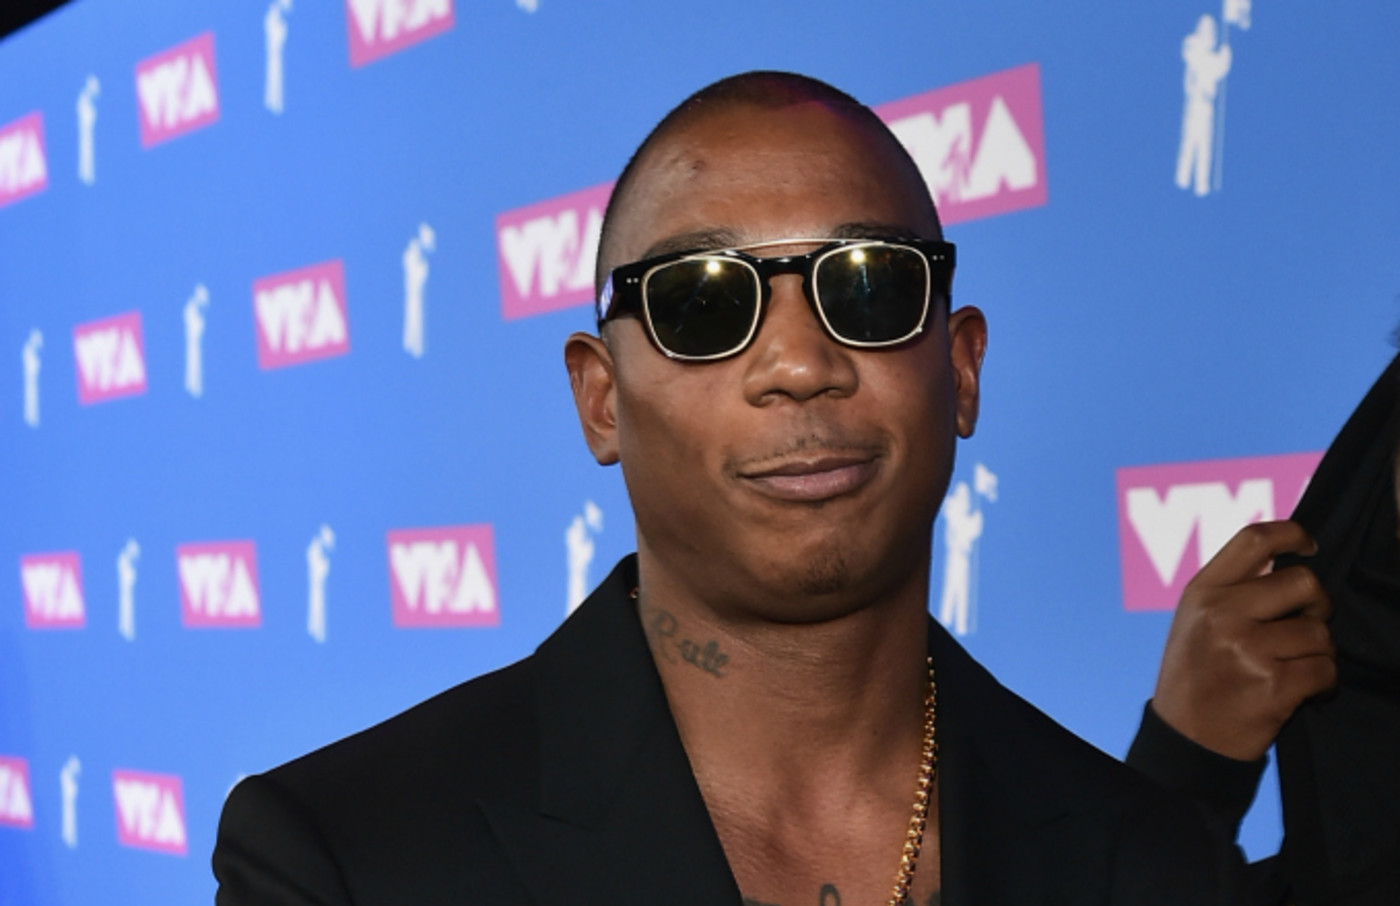 Ja Rule attends the 2018 MTV Video Music Awards at Radio City Music Hall